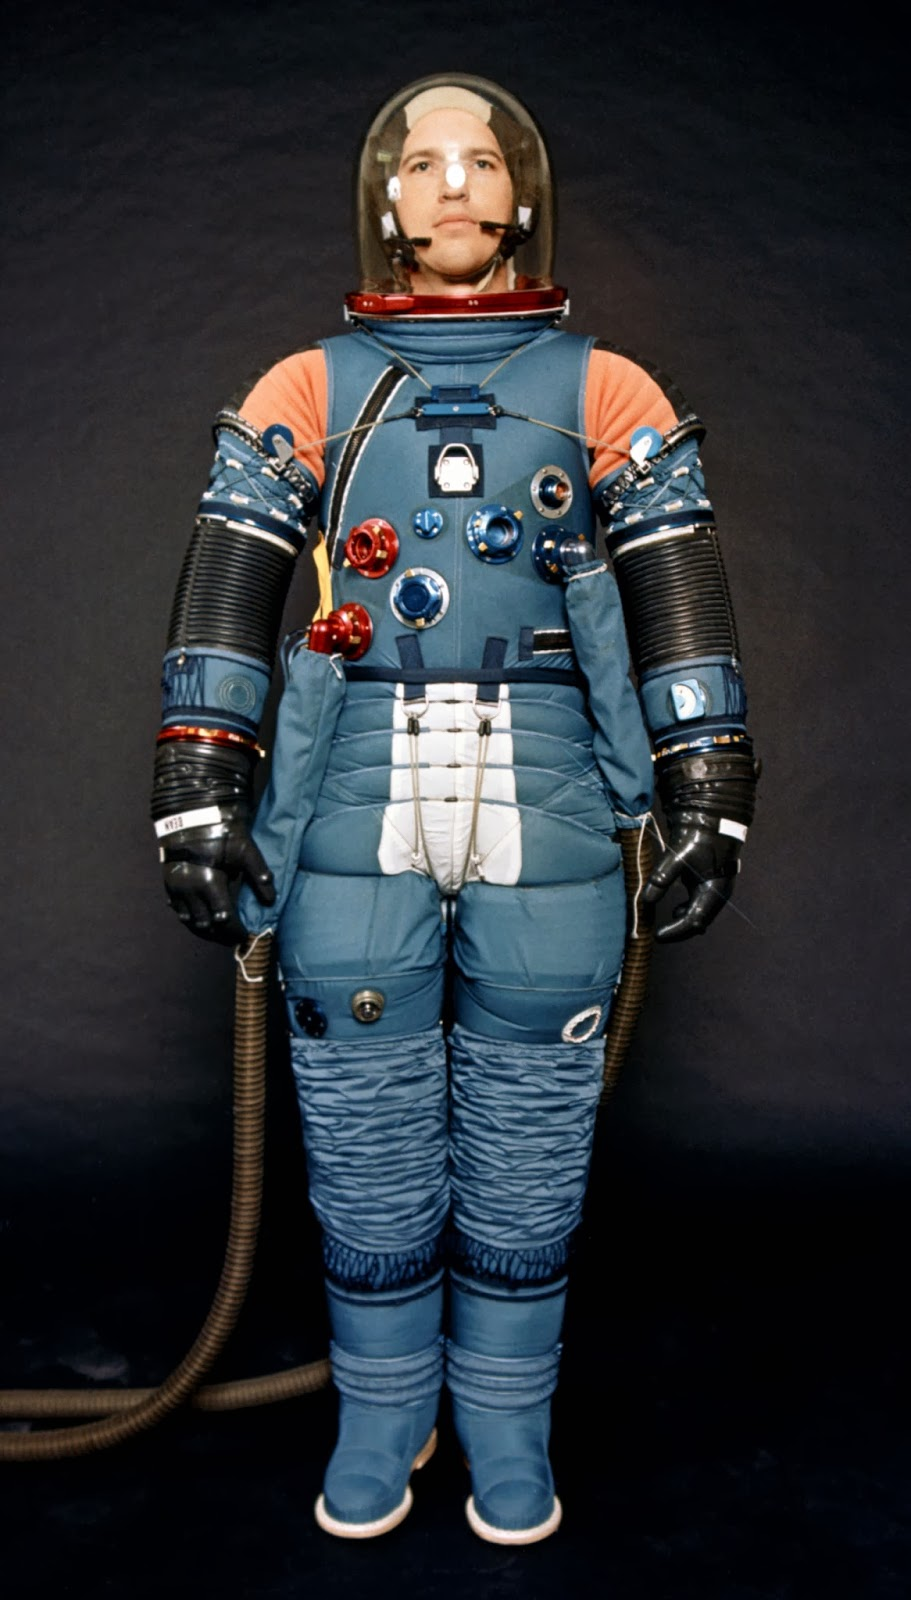 apollo 7 space suits - photo #34